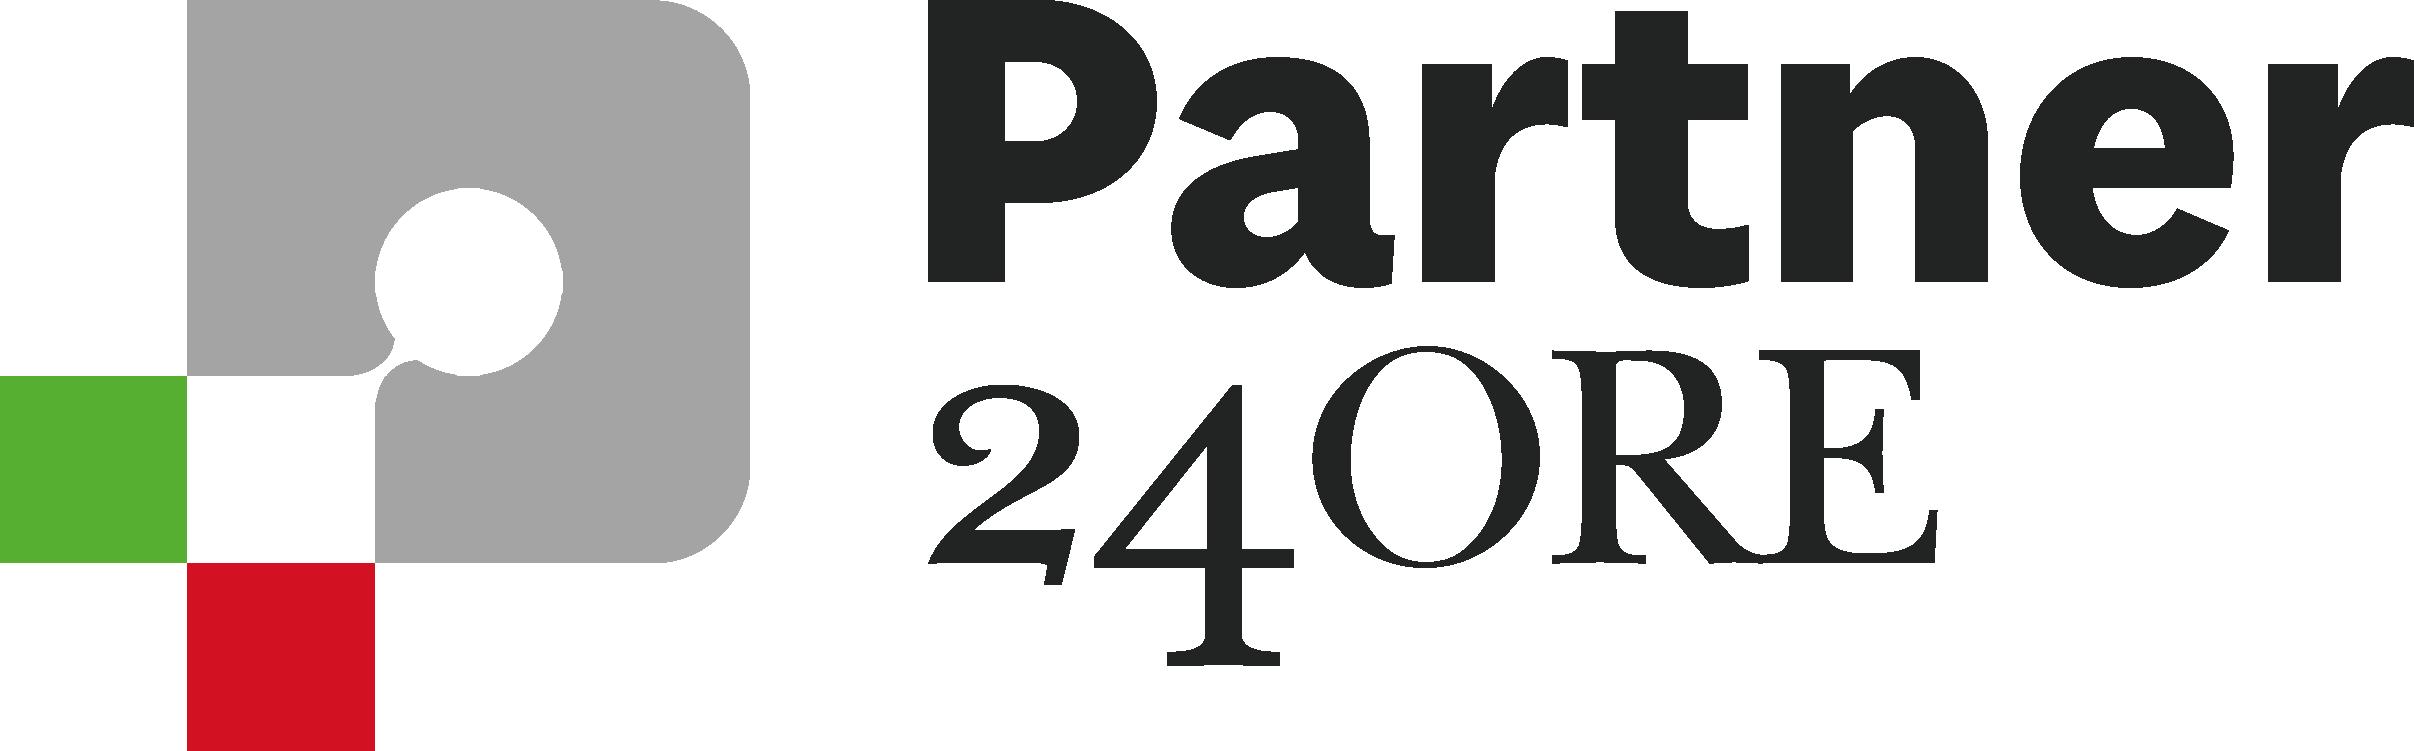 Partner24Ore_positivo_colore.png